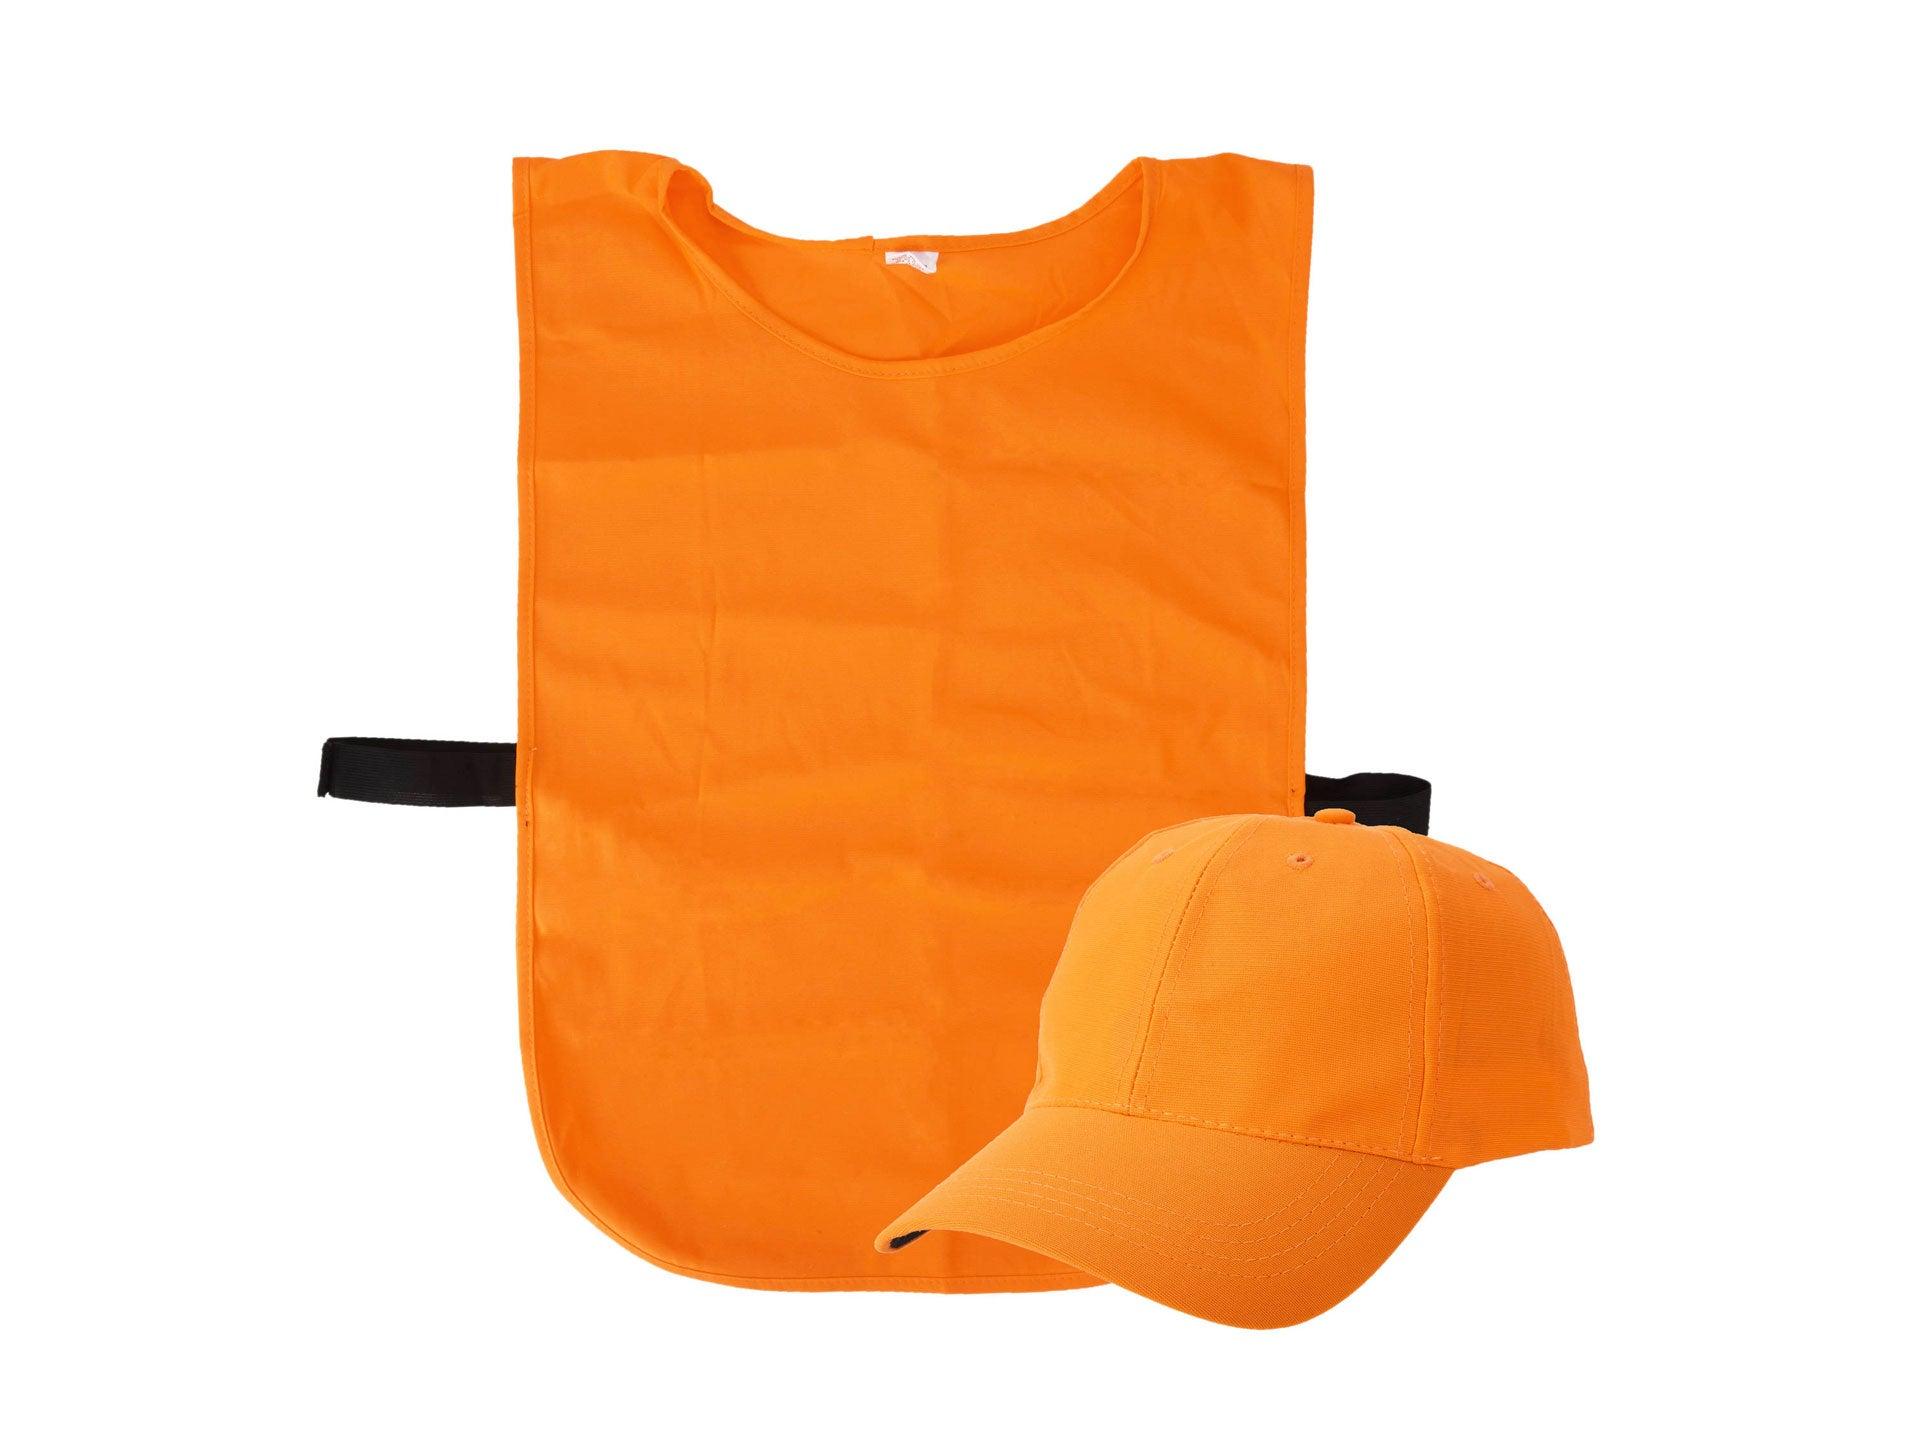 Blaze orange vest and hat